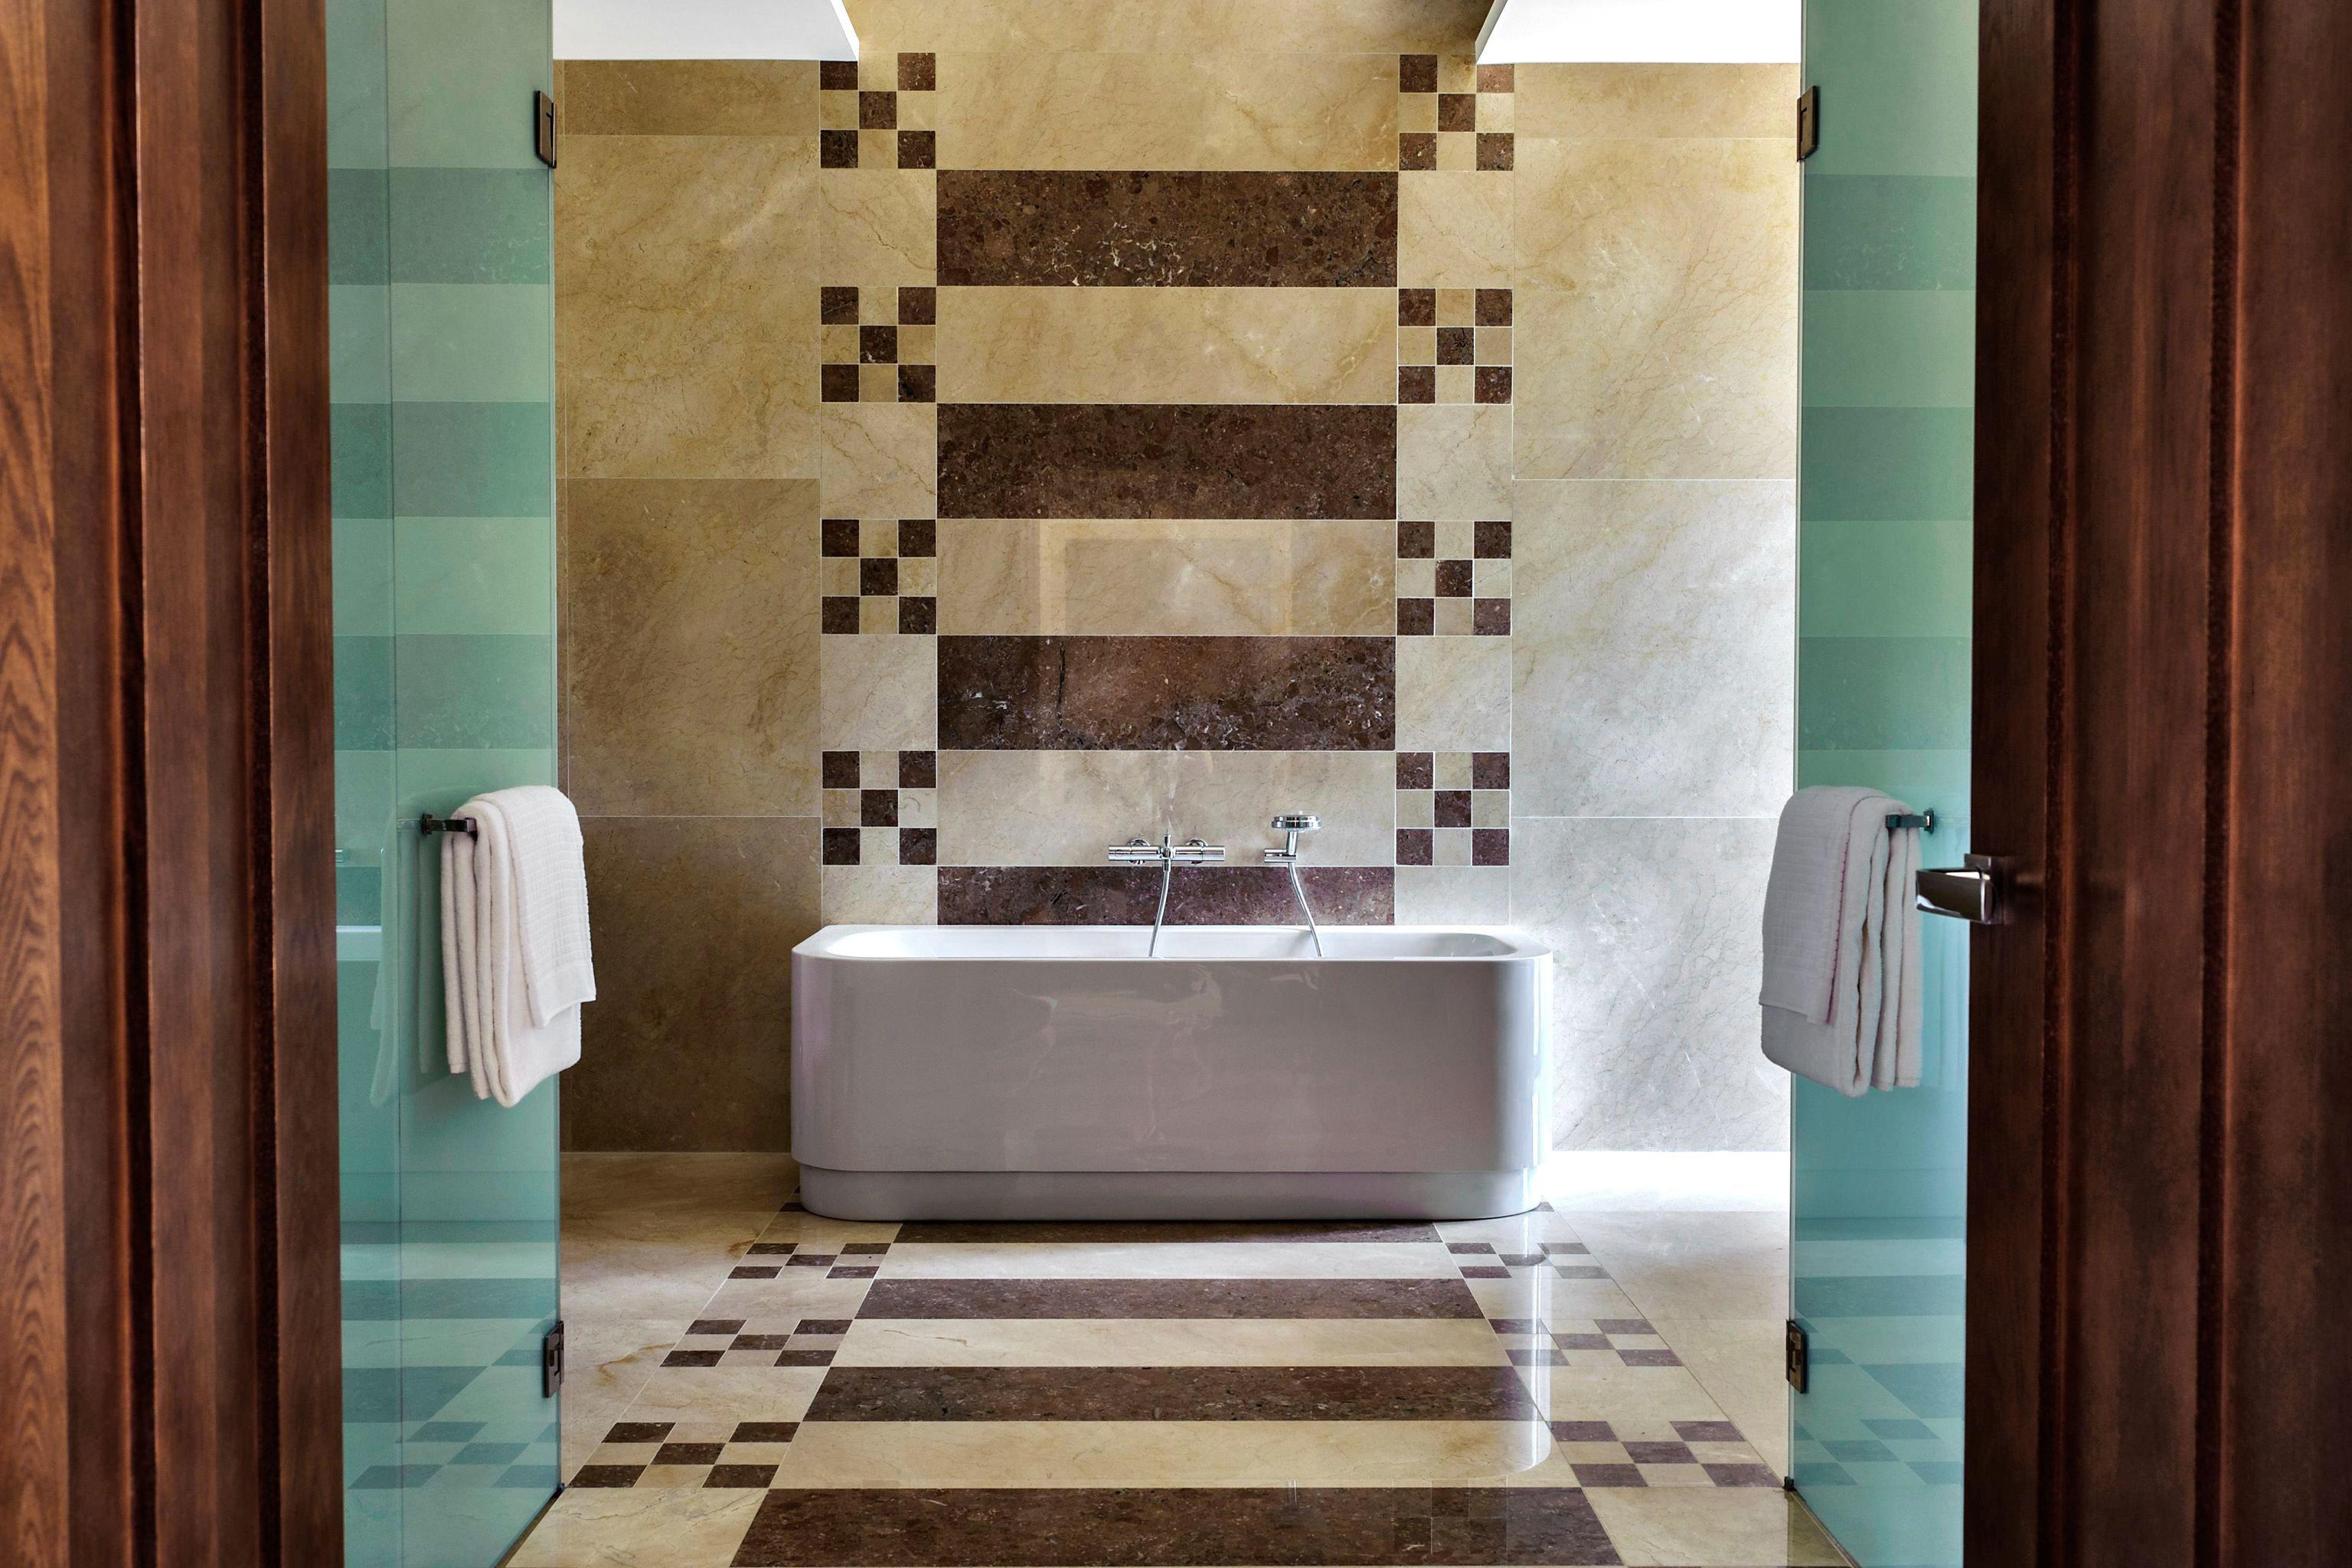 Bath Luxury Romantic Rustic bathroom tile flooring plumbing fixture home tub tiled bathtub